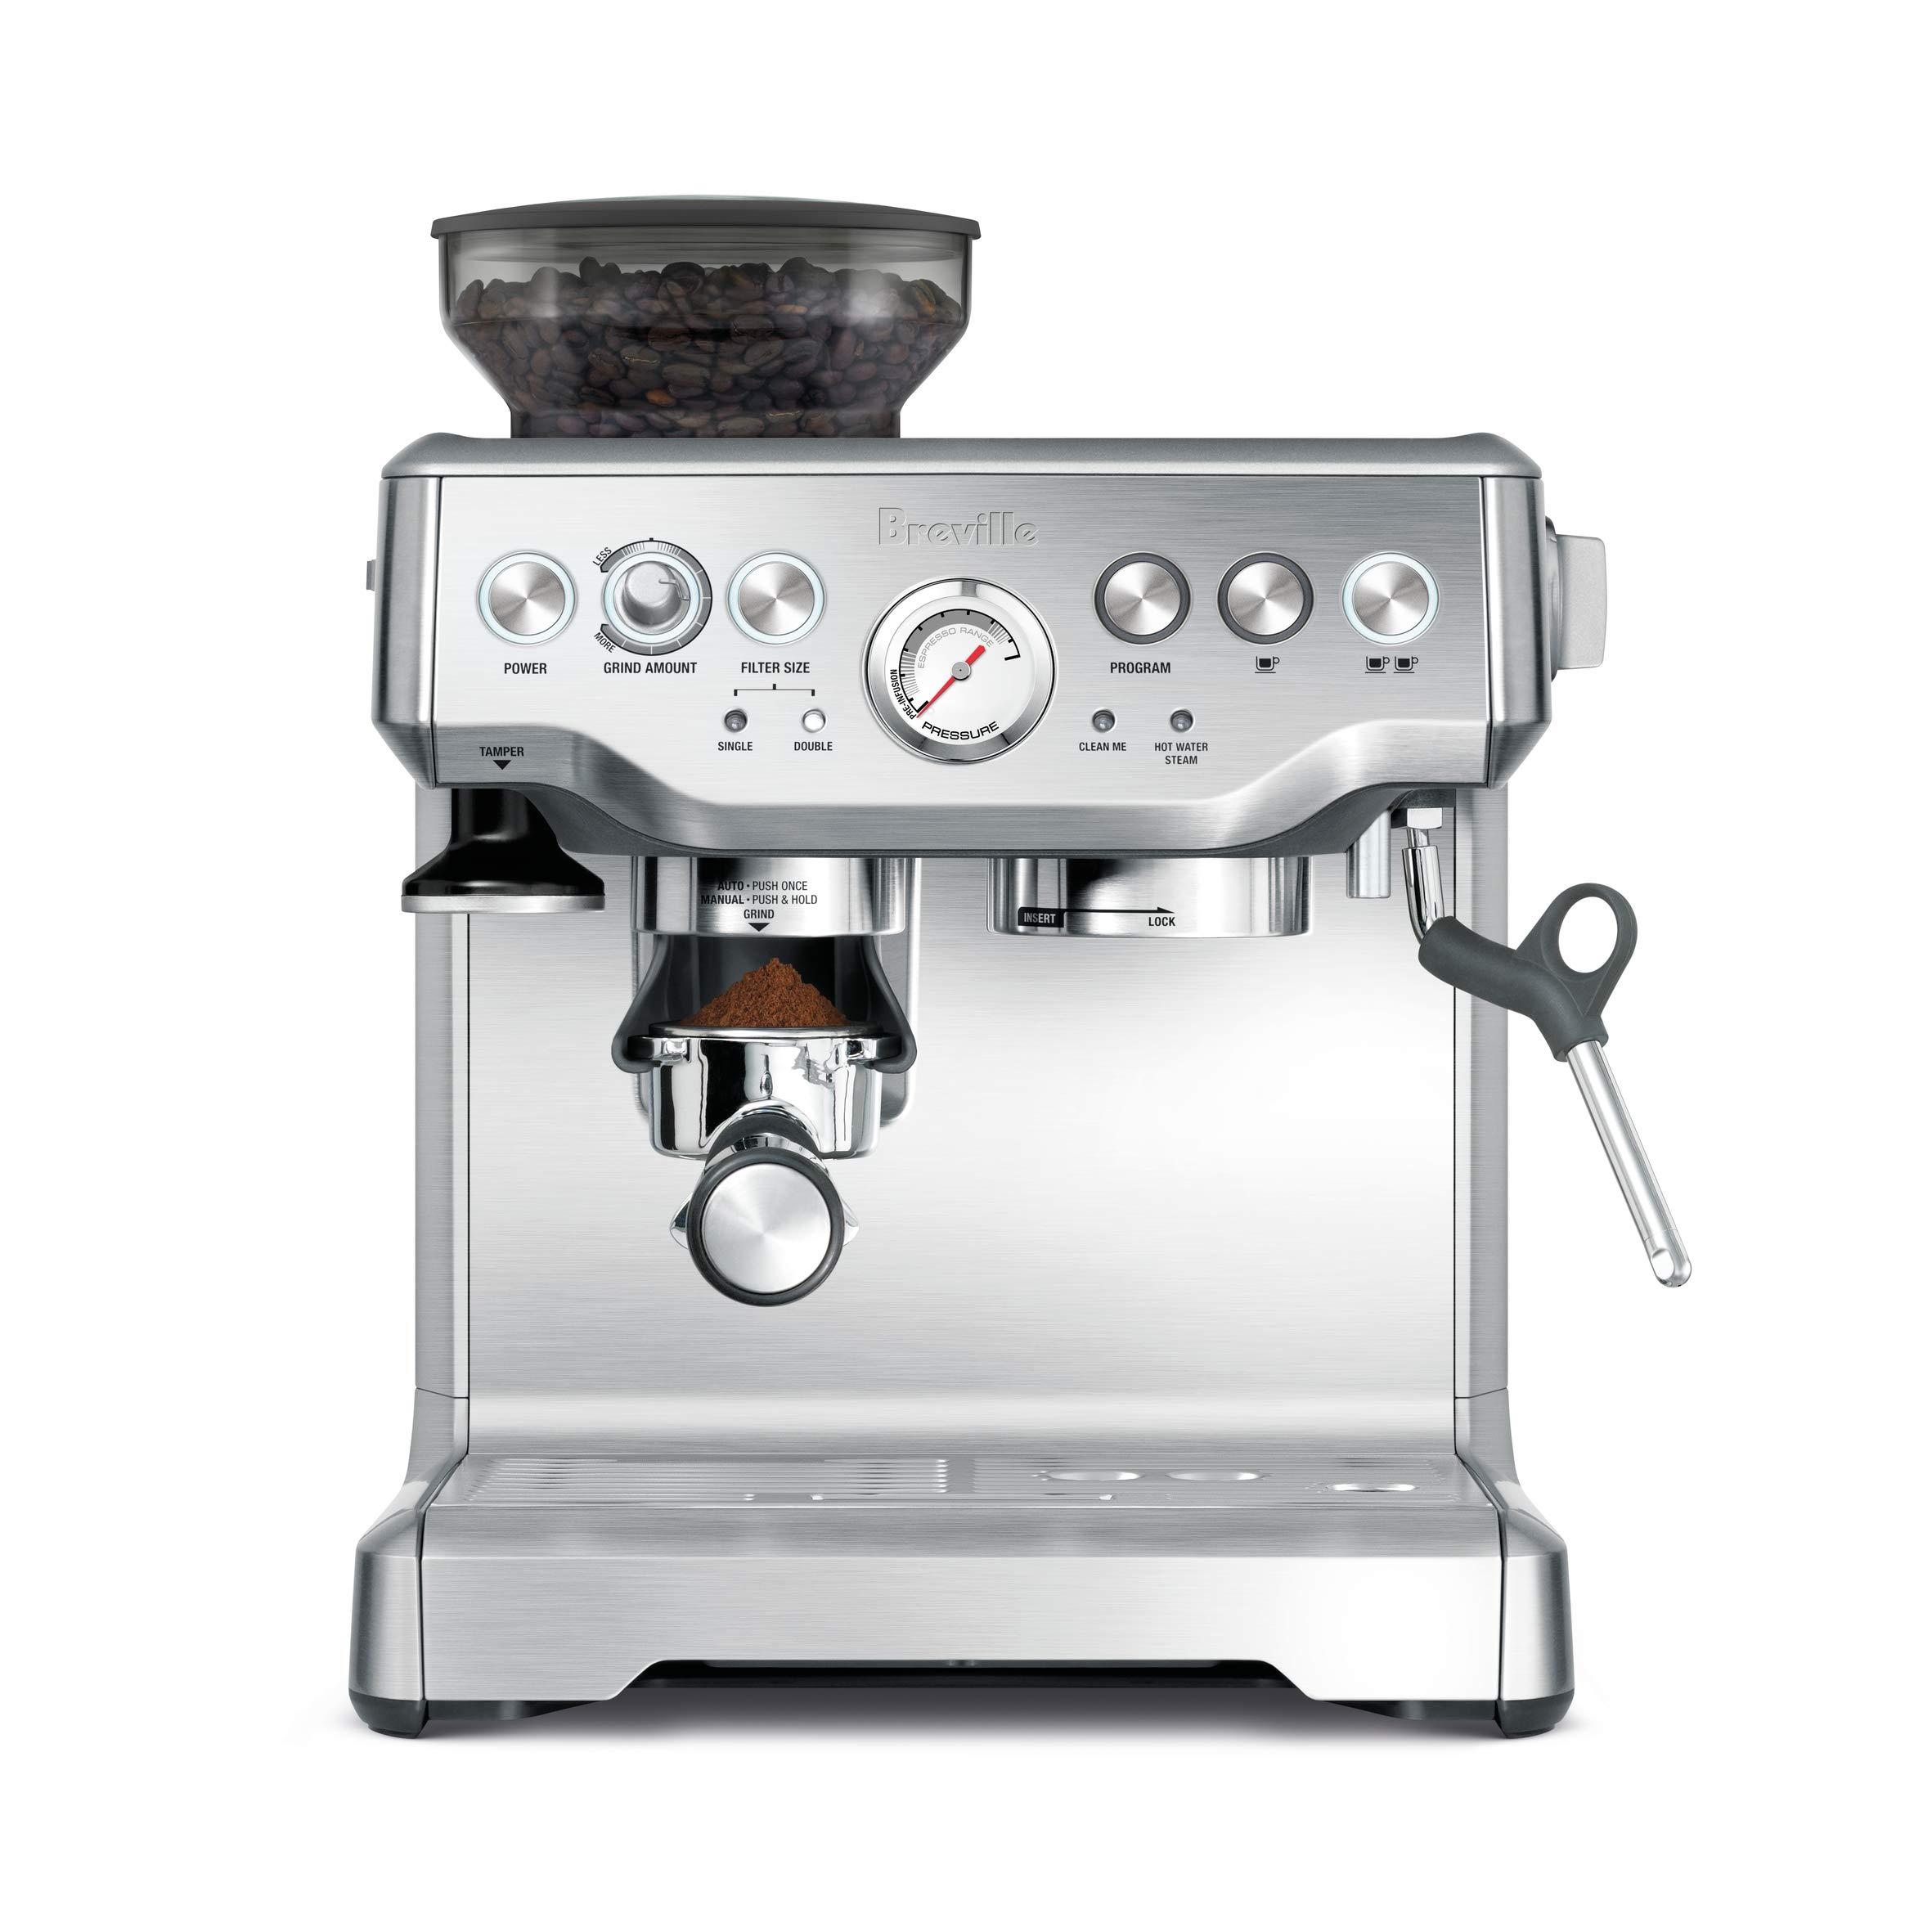 Breville the Barista Express Espresso Machine, BES870XL by Breville